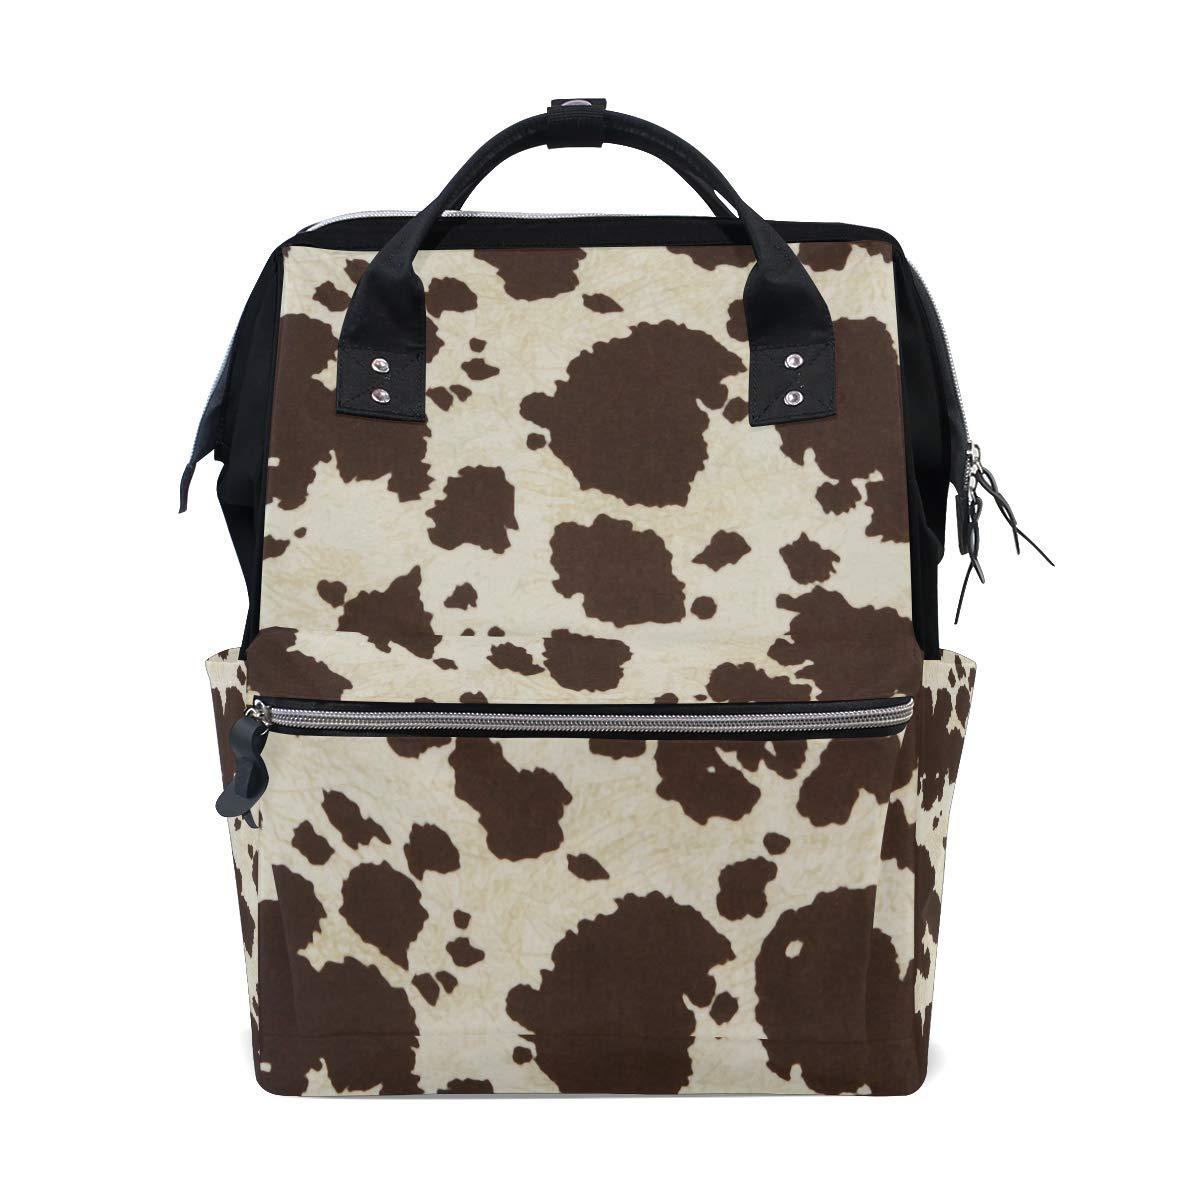 Snake Print Mommy Travel Backpacks Large PU Leather Maternity Nappy Bags UK